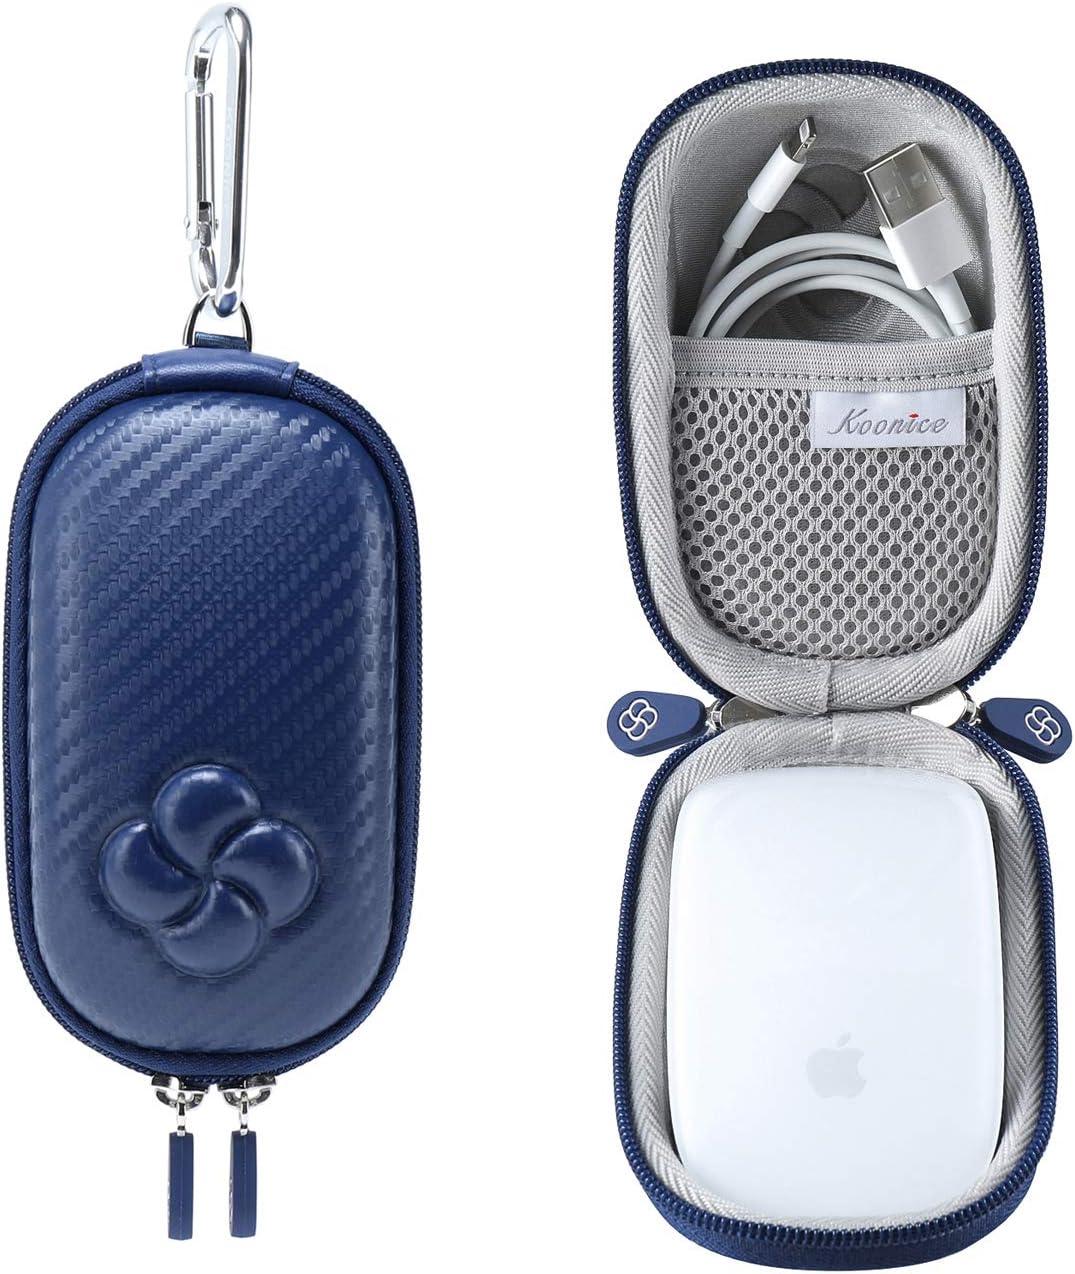 Koonice Hard Case Compatible for Apple Magic Mouse (I and II 2nd Gen) Including Carabiner (Navy Blue)